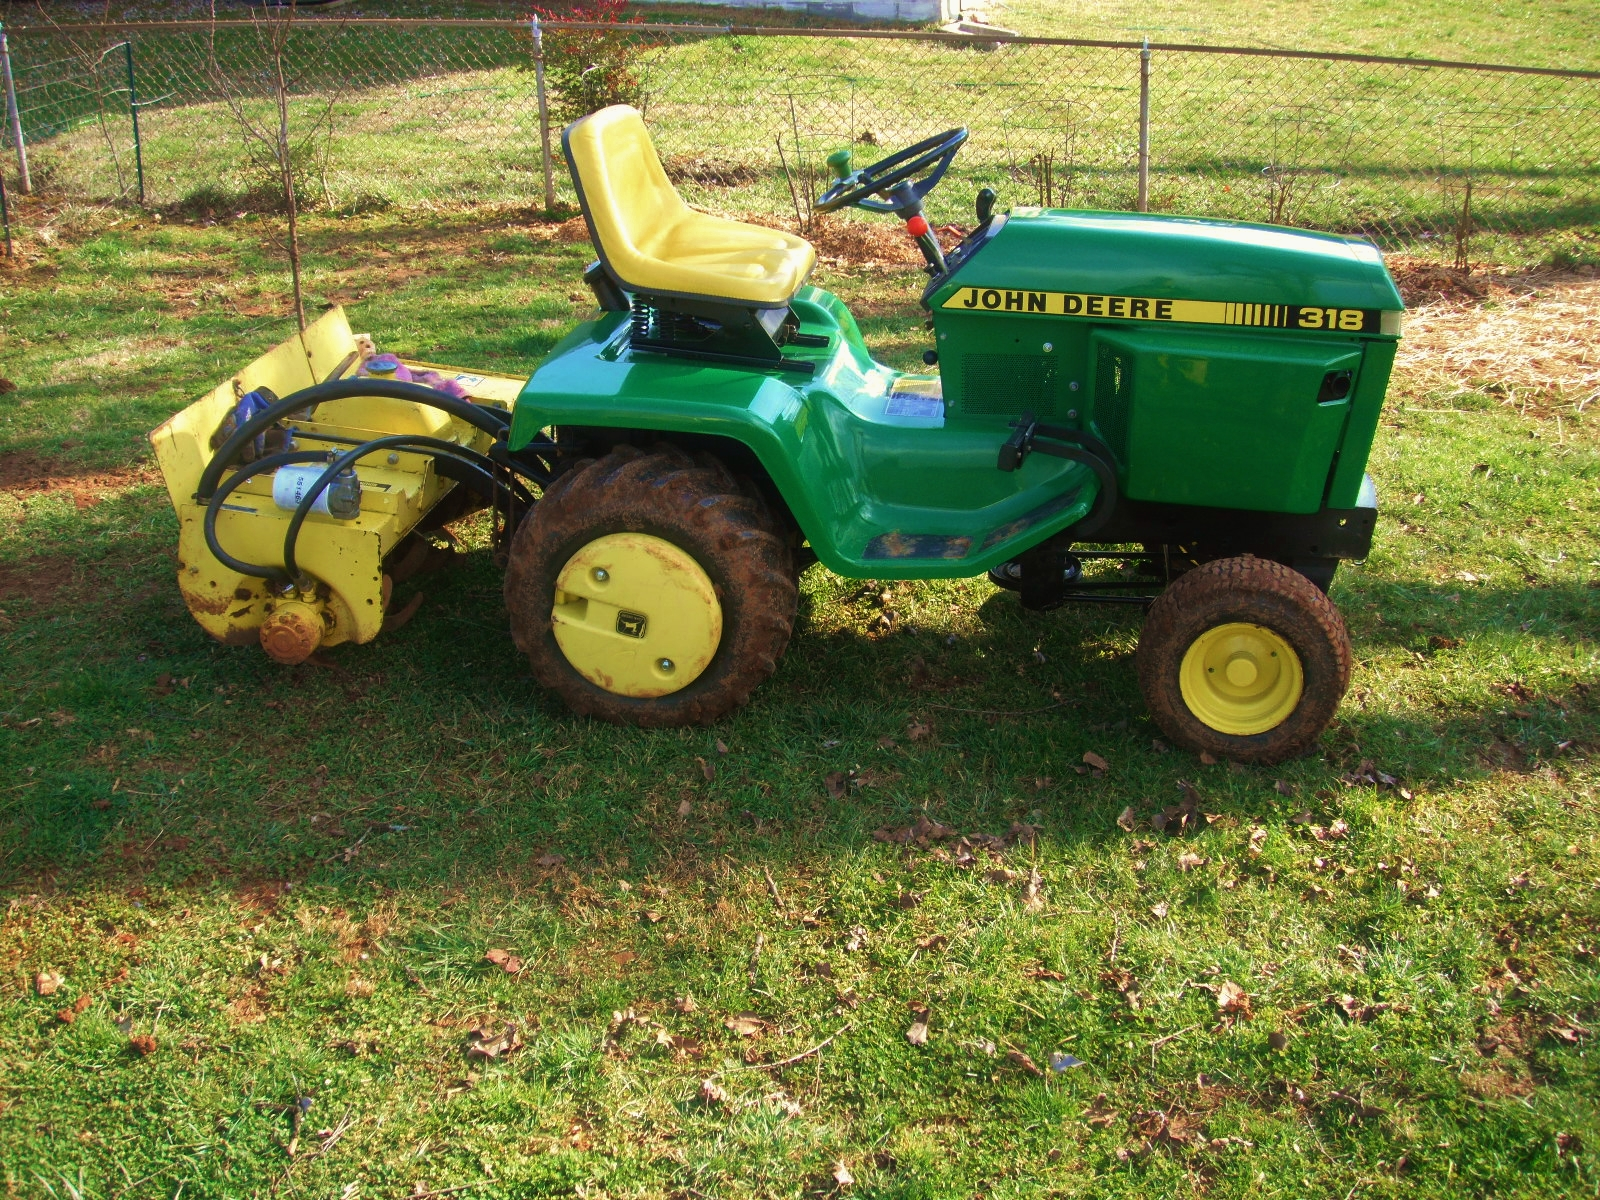 1969 john deere 140 wiring diagram nema l14 30 tiller attachment for garden tractor lawn ebay